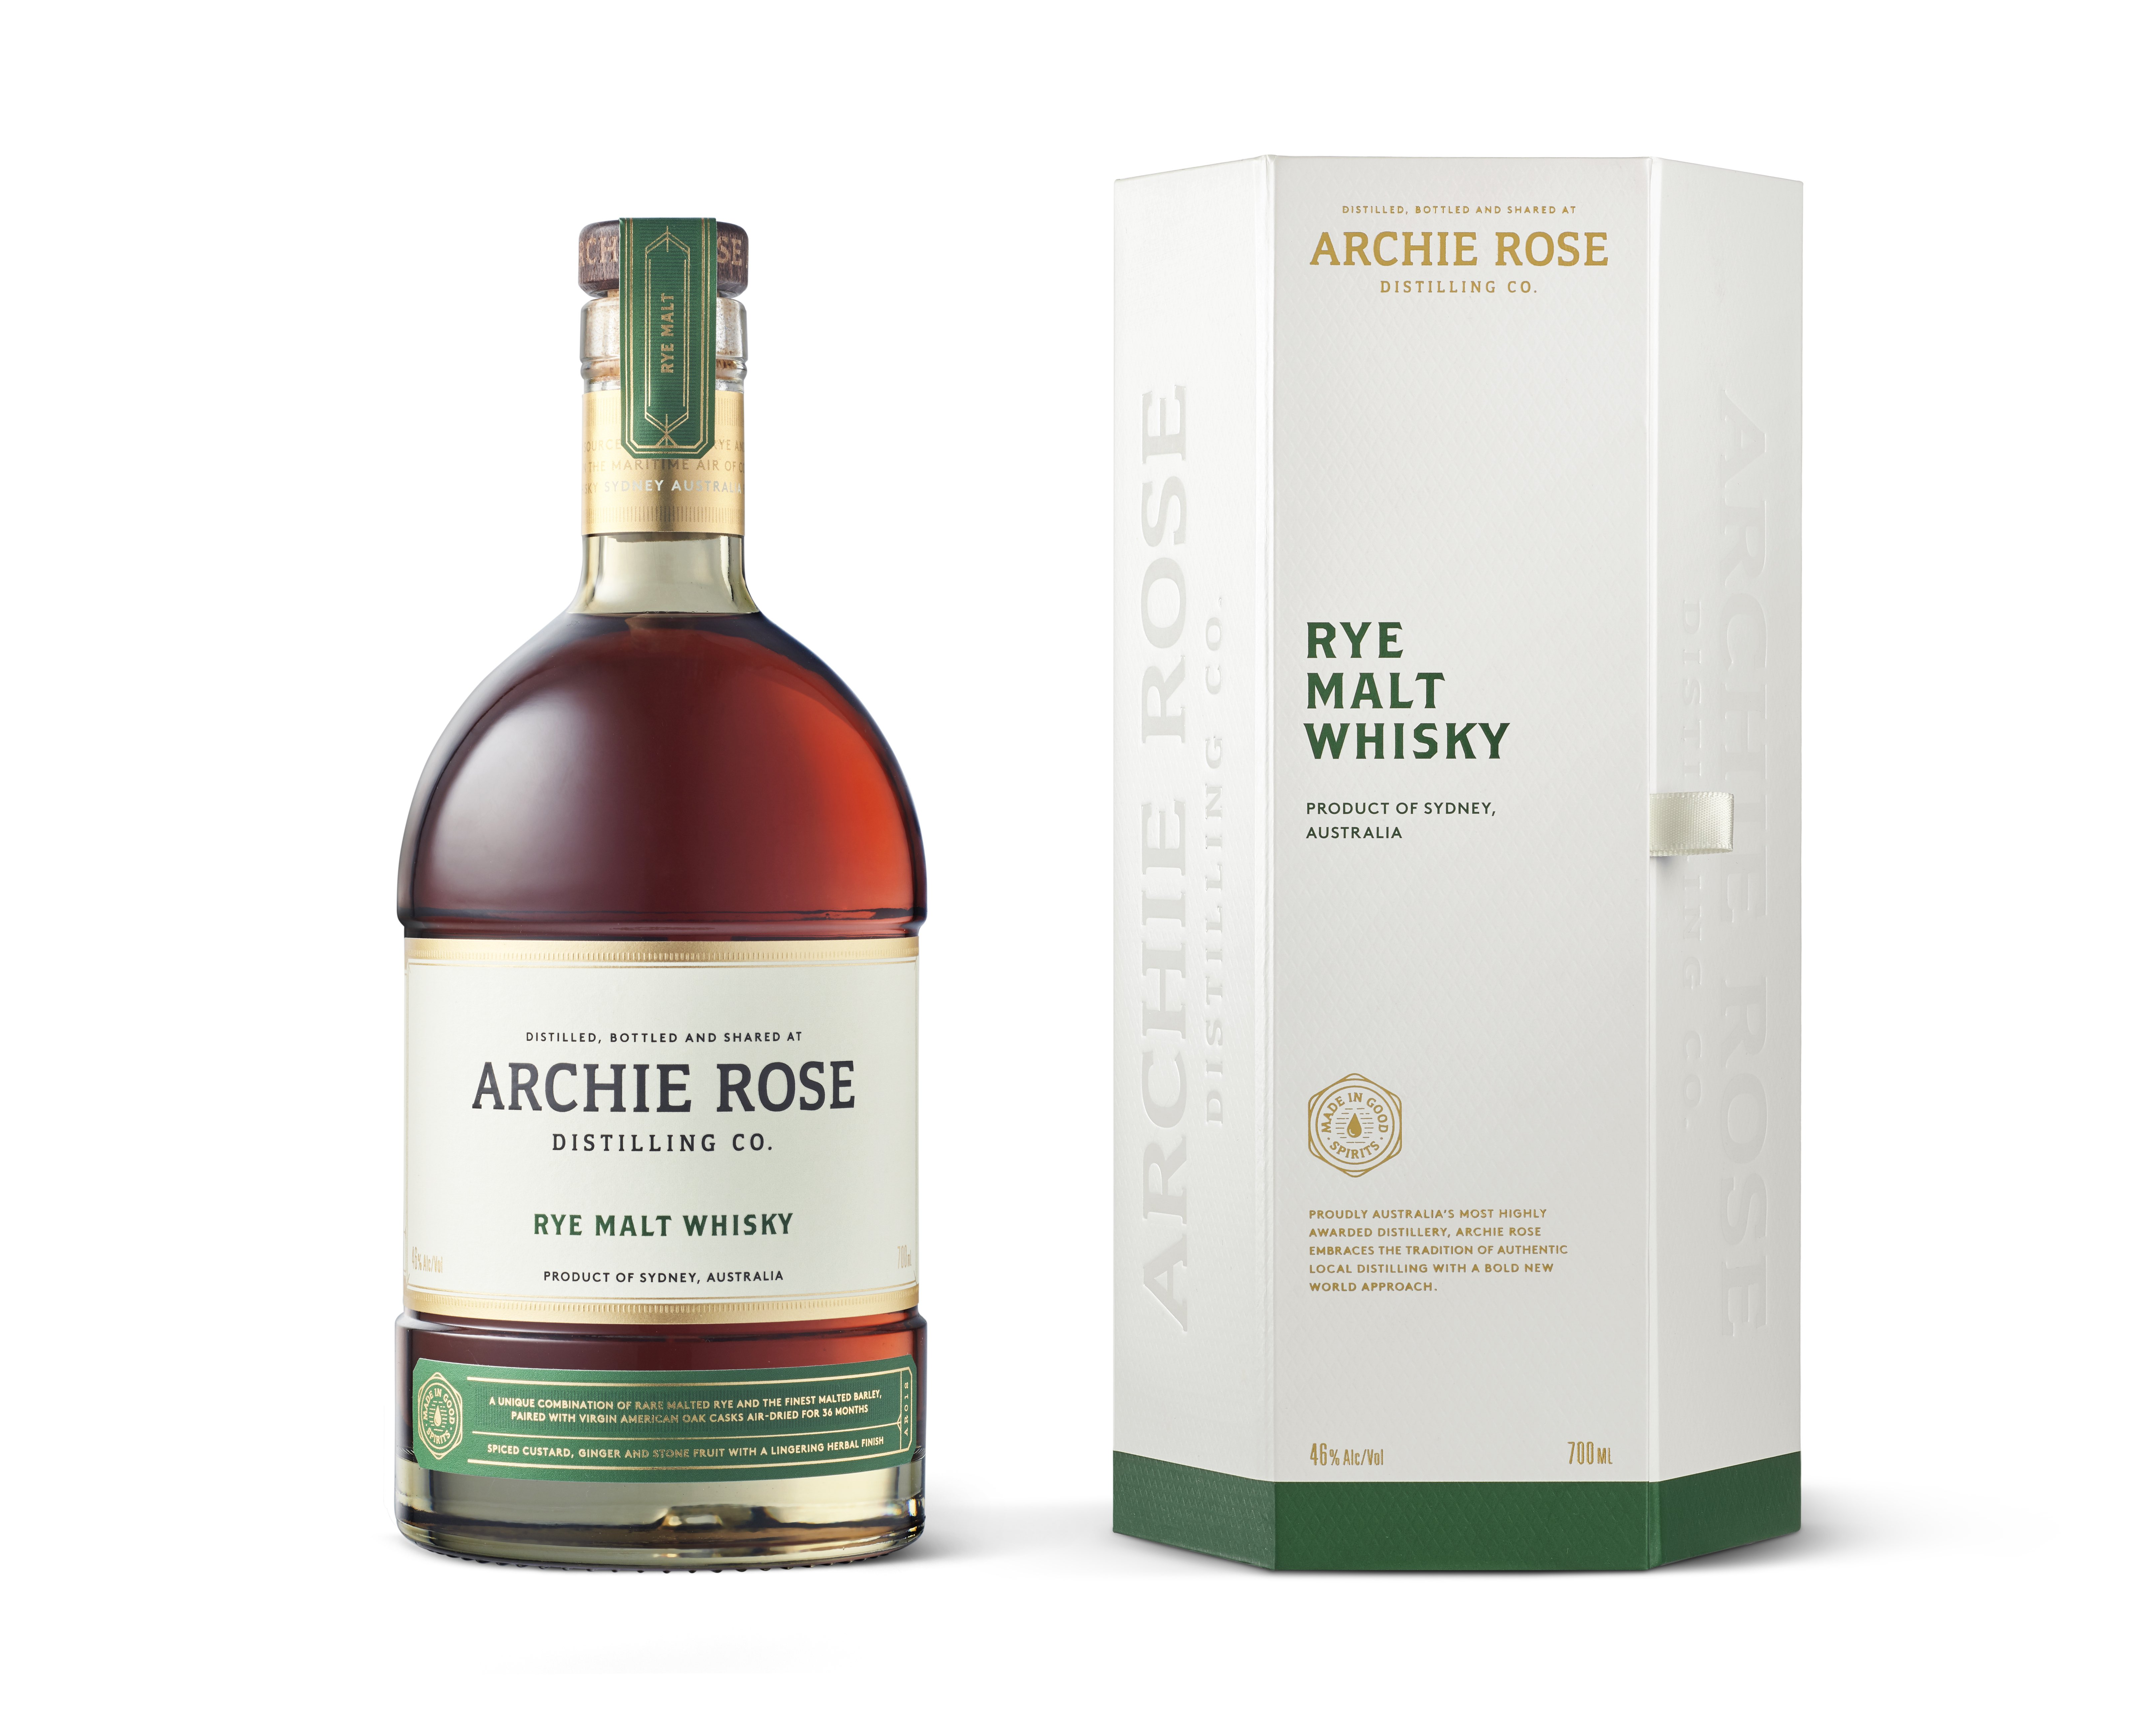 Archie Rose Rye Malt Whisky